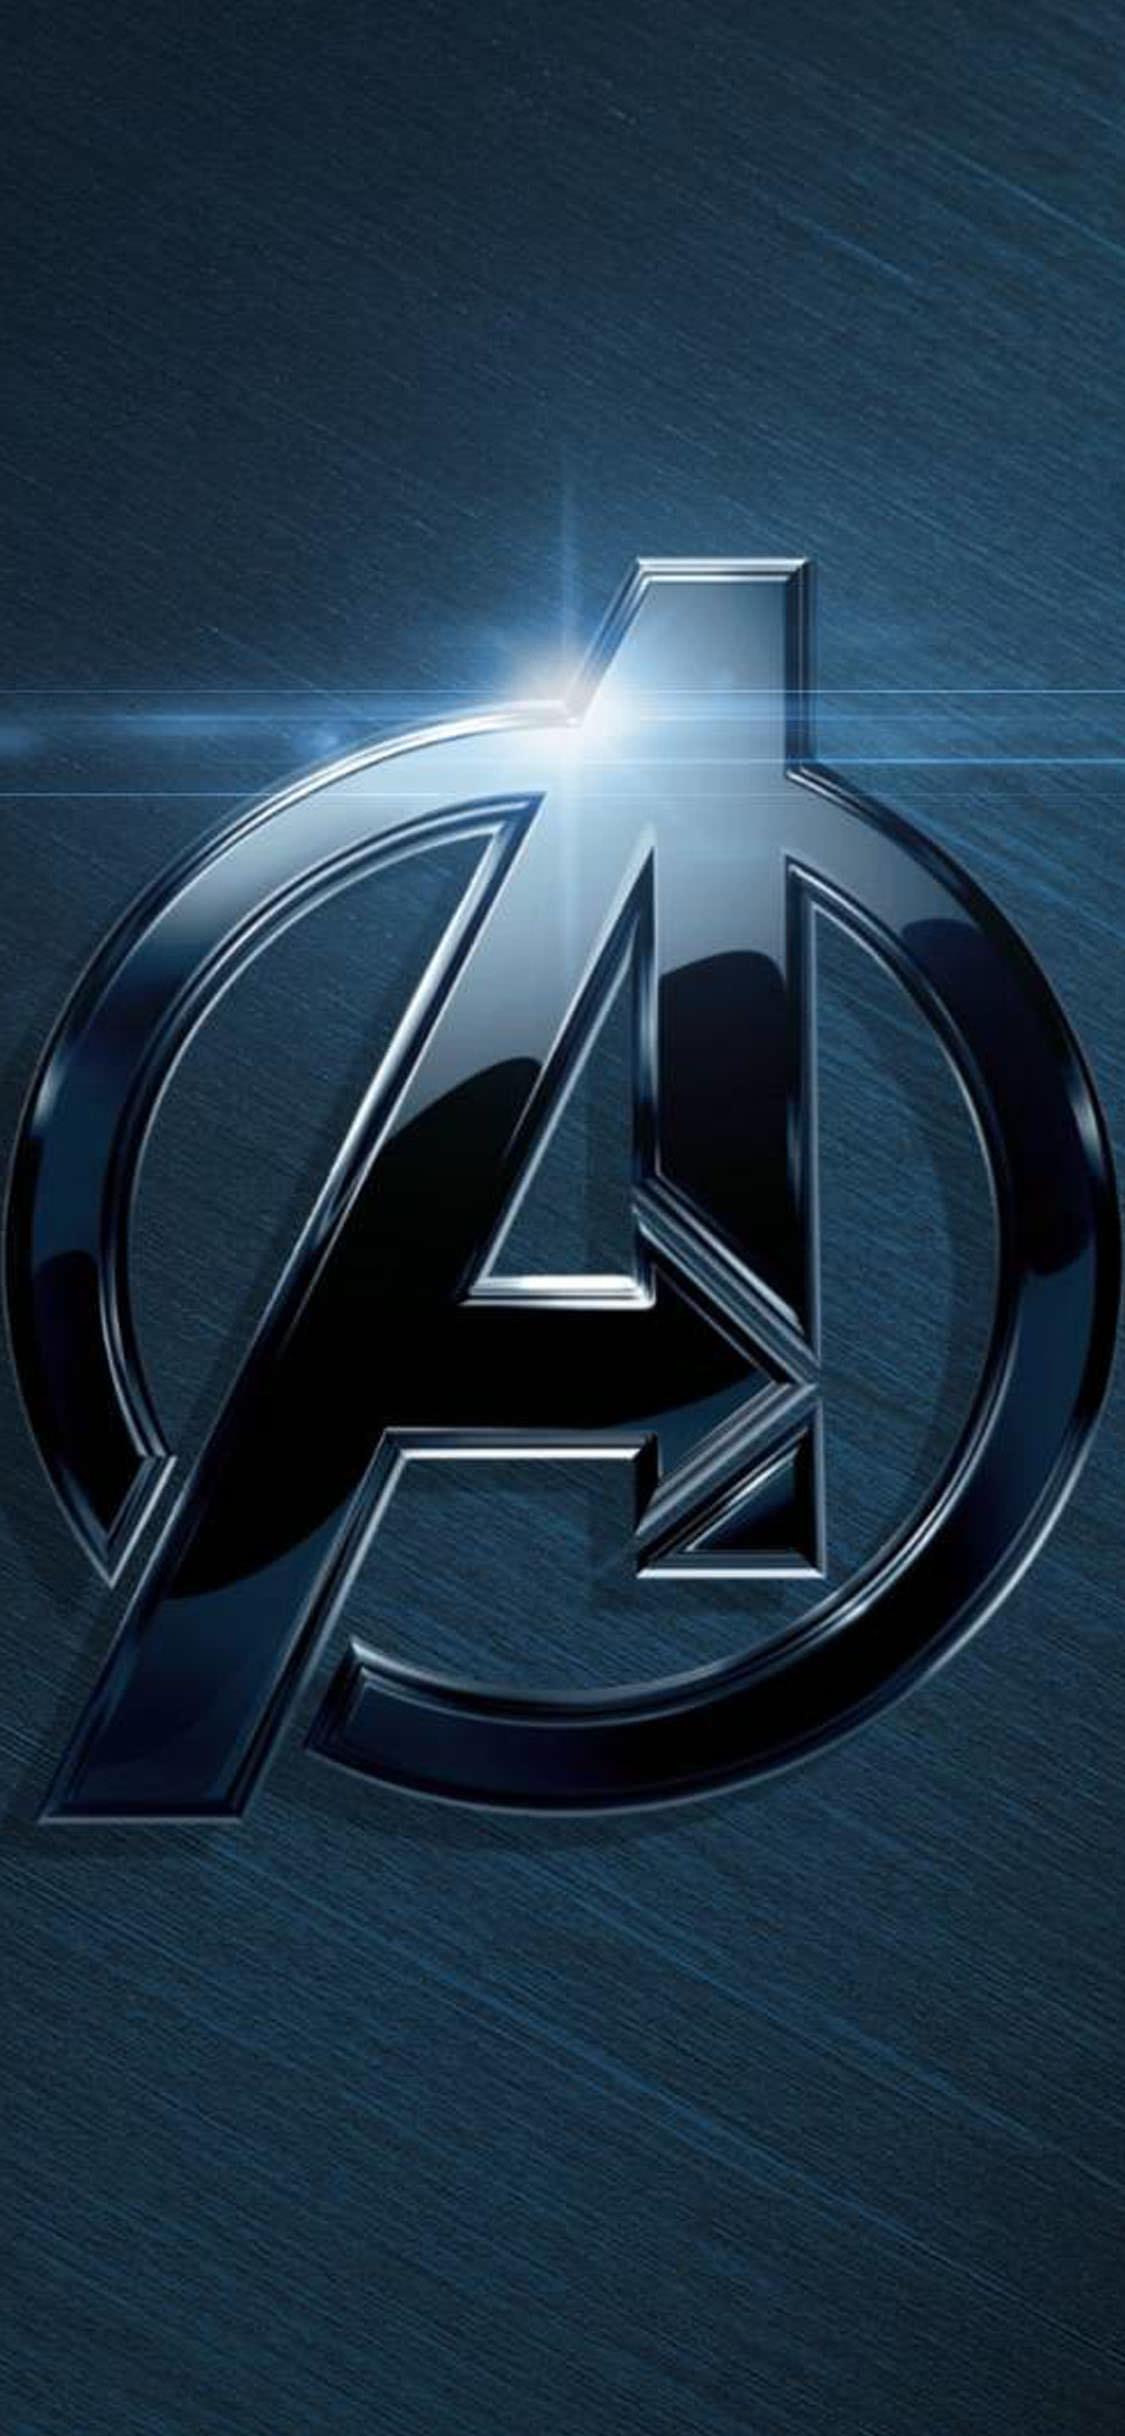 25 Best Avengers Iphone Wallpapers 2018 Templatefor